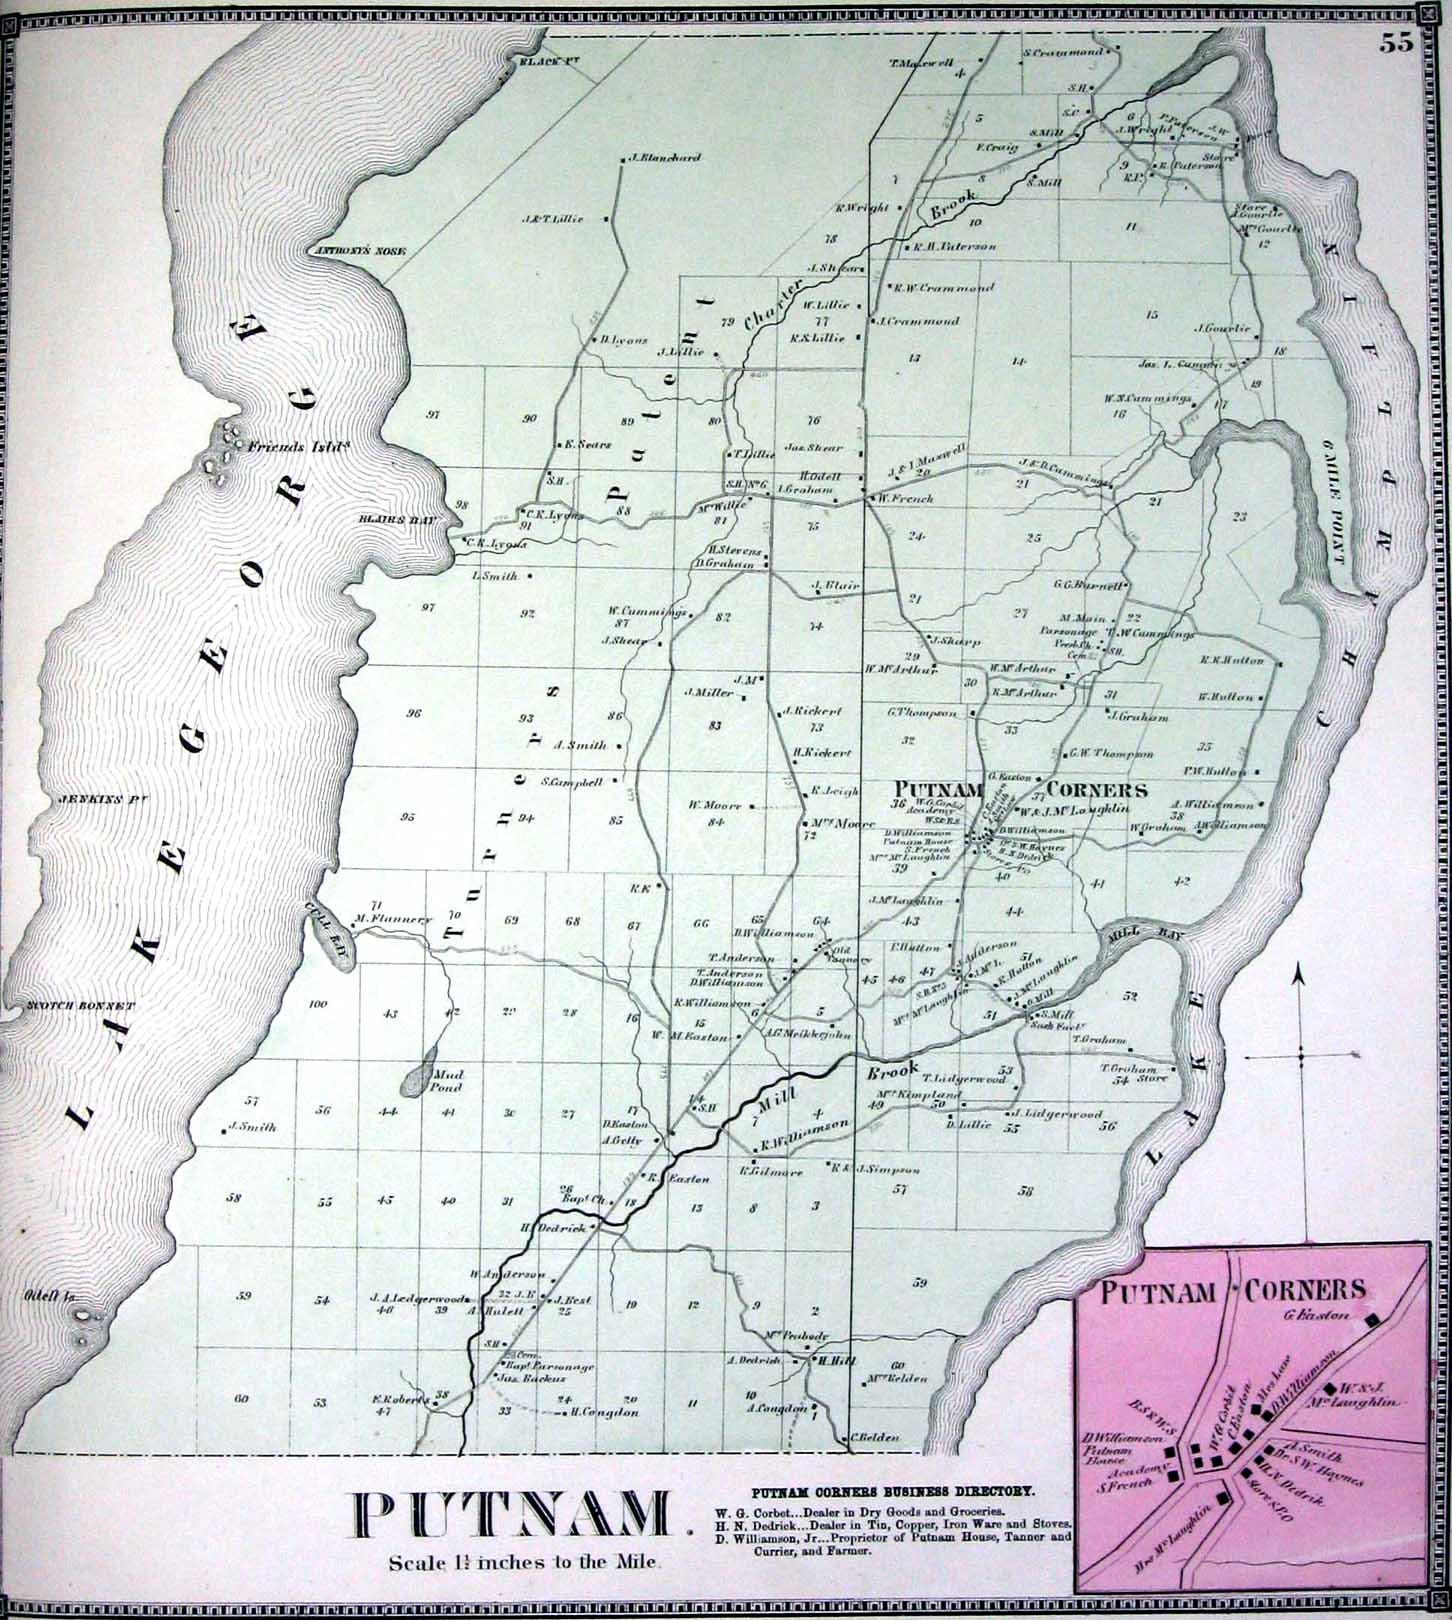 putnam station Lake george, crow point, indian point,gull bay, glenburnie, black point, huletts, putnam station, hague, rogers rock, new york.